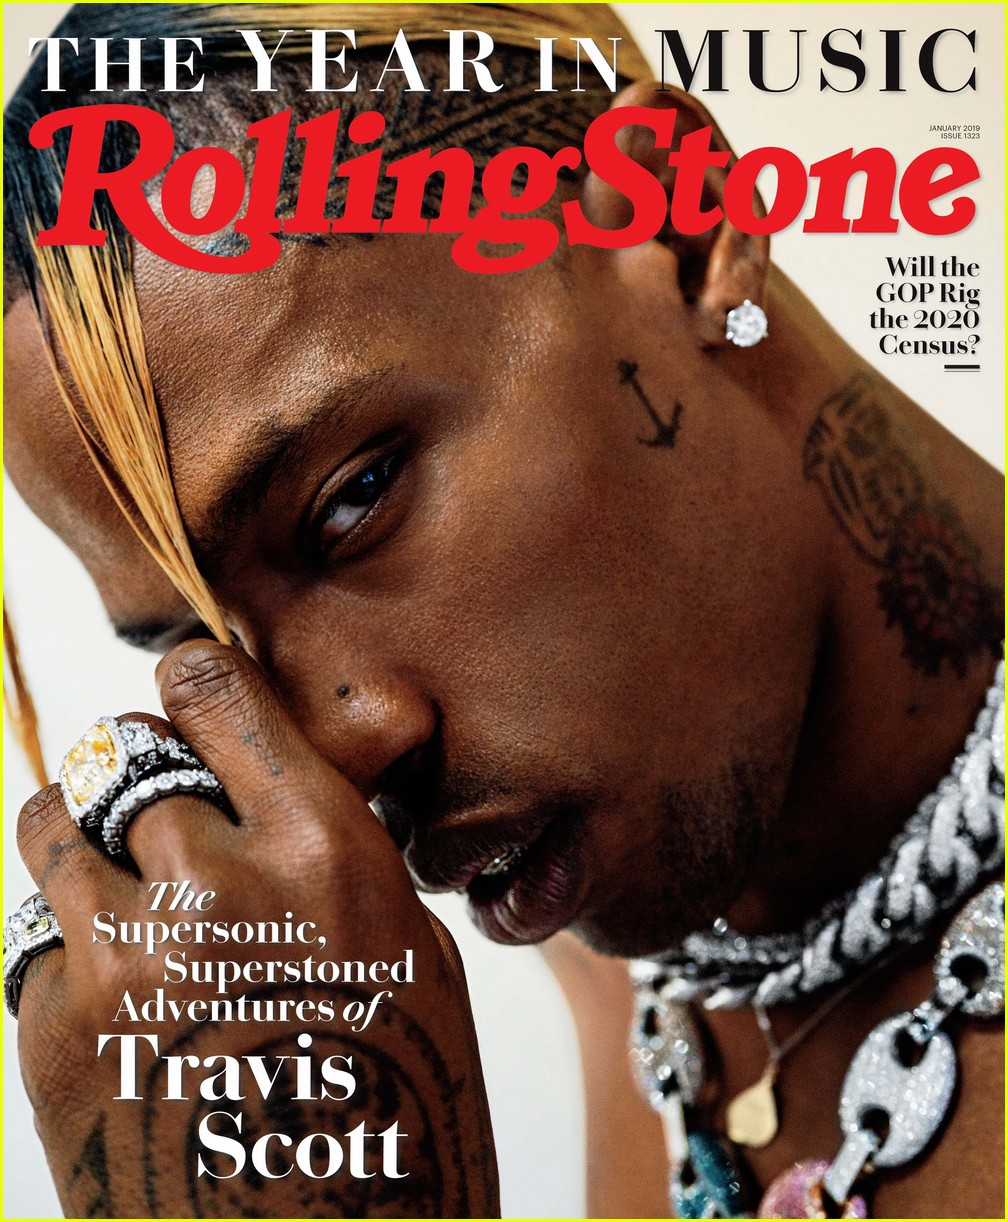 travis scott rolling stone 014200763